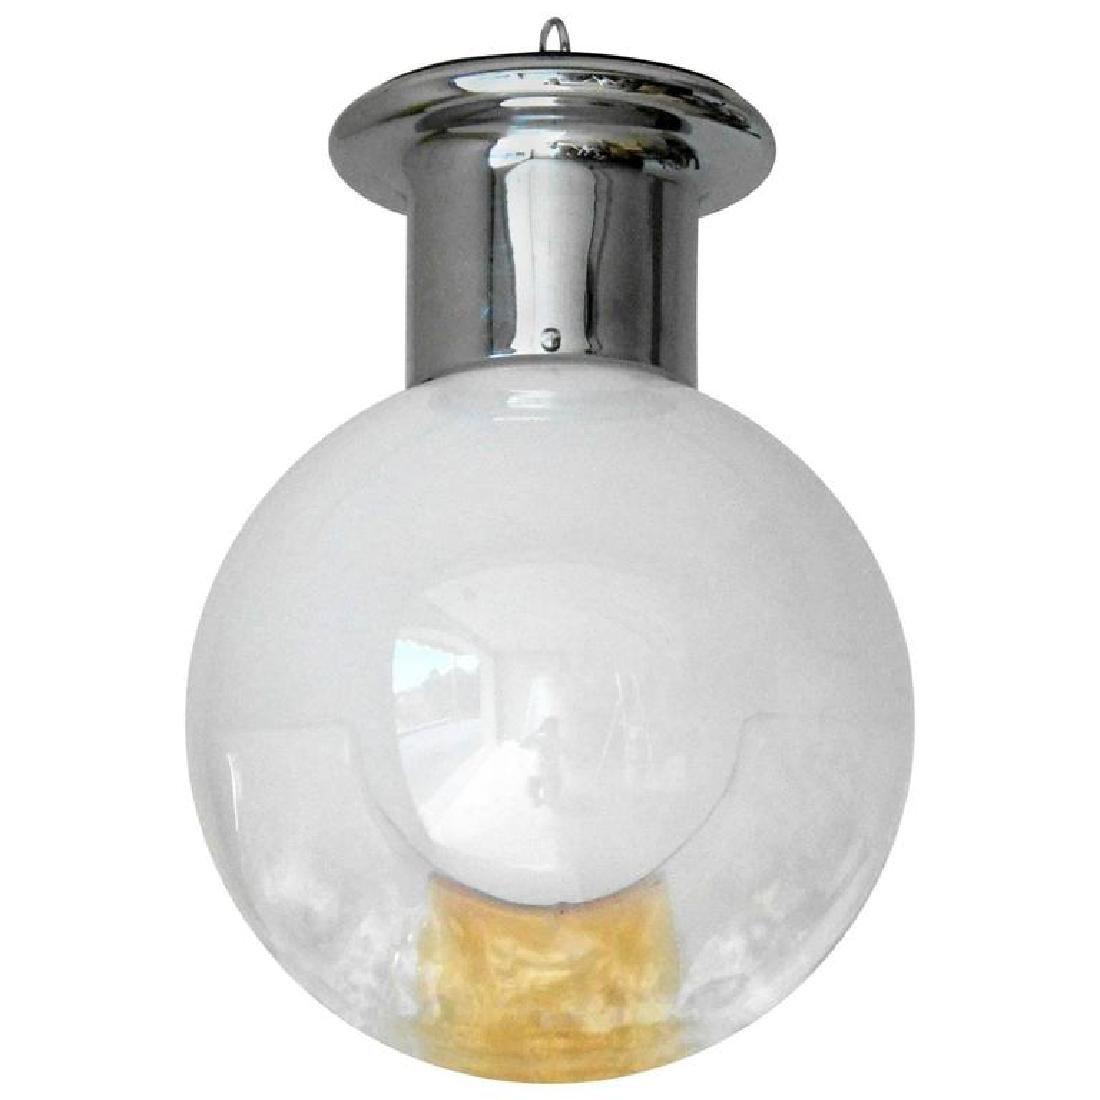 Murano Opaline and Amber Globe by Mazzega